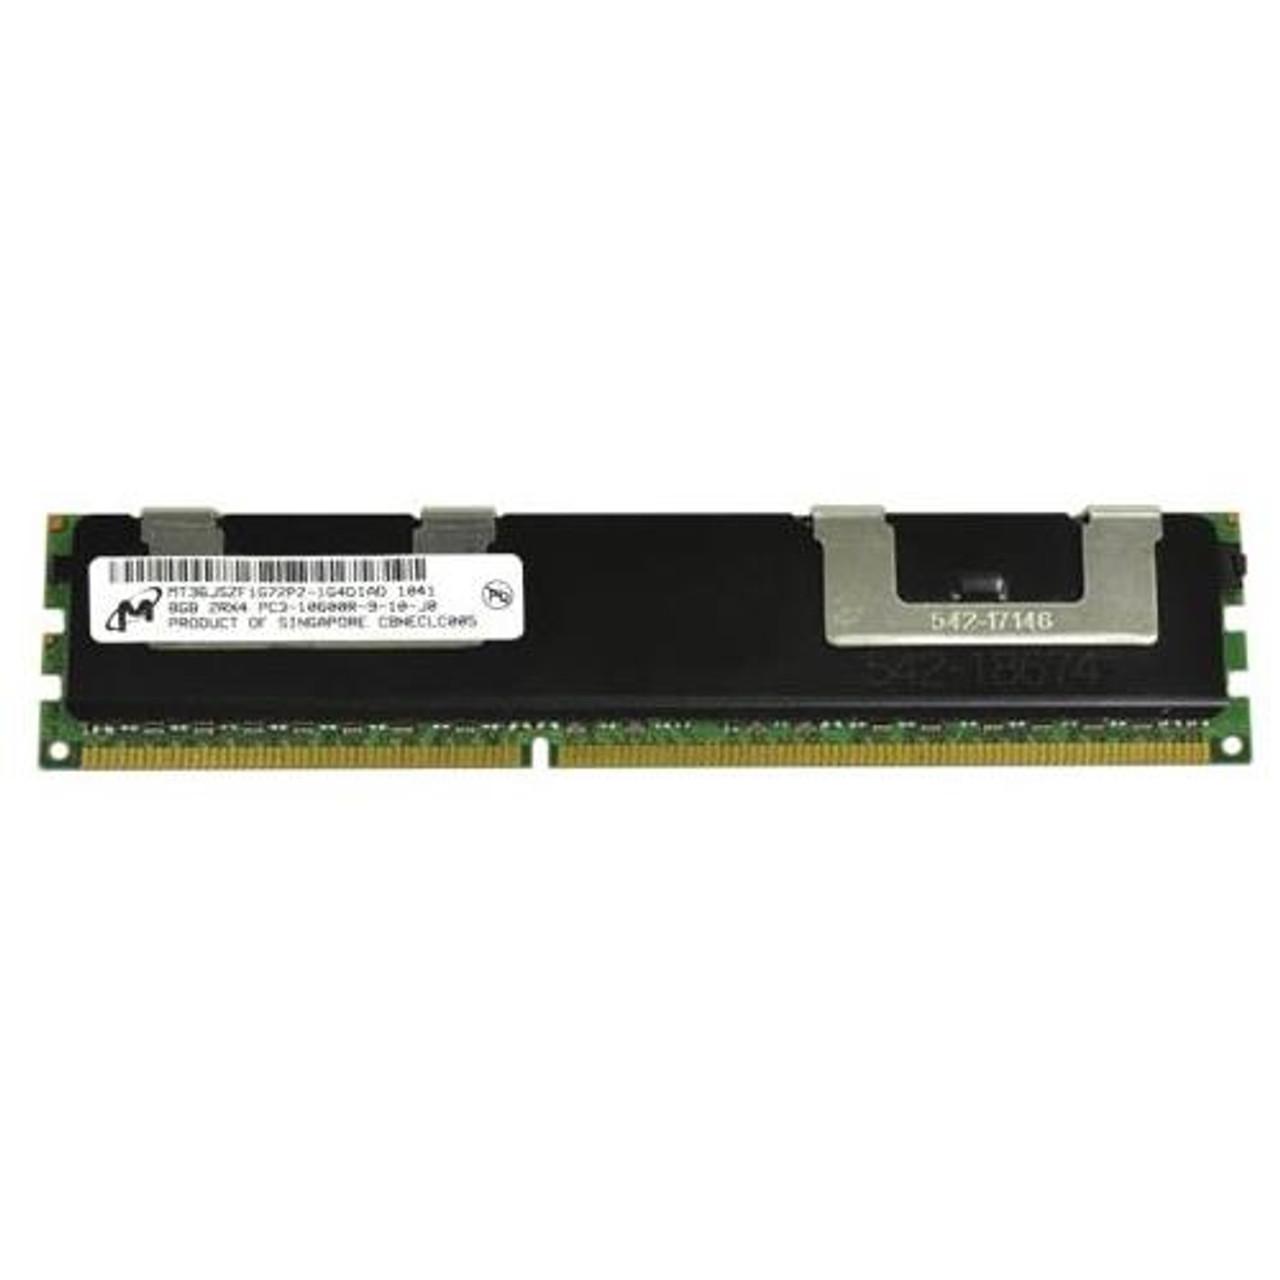 Micron 8GB PC3-8500 DDR3-1066MHz ECC Registered Server RAMMT36JSZS1G72PY-1G1